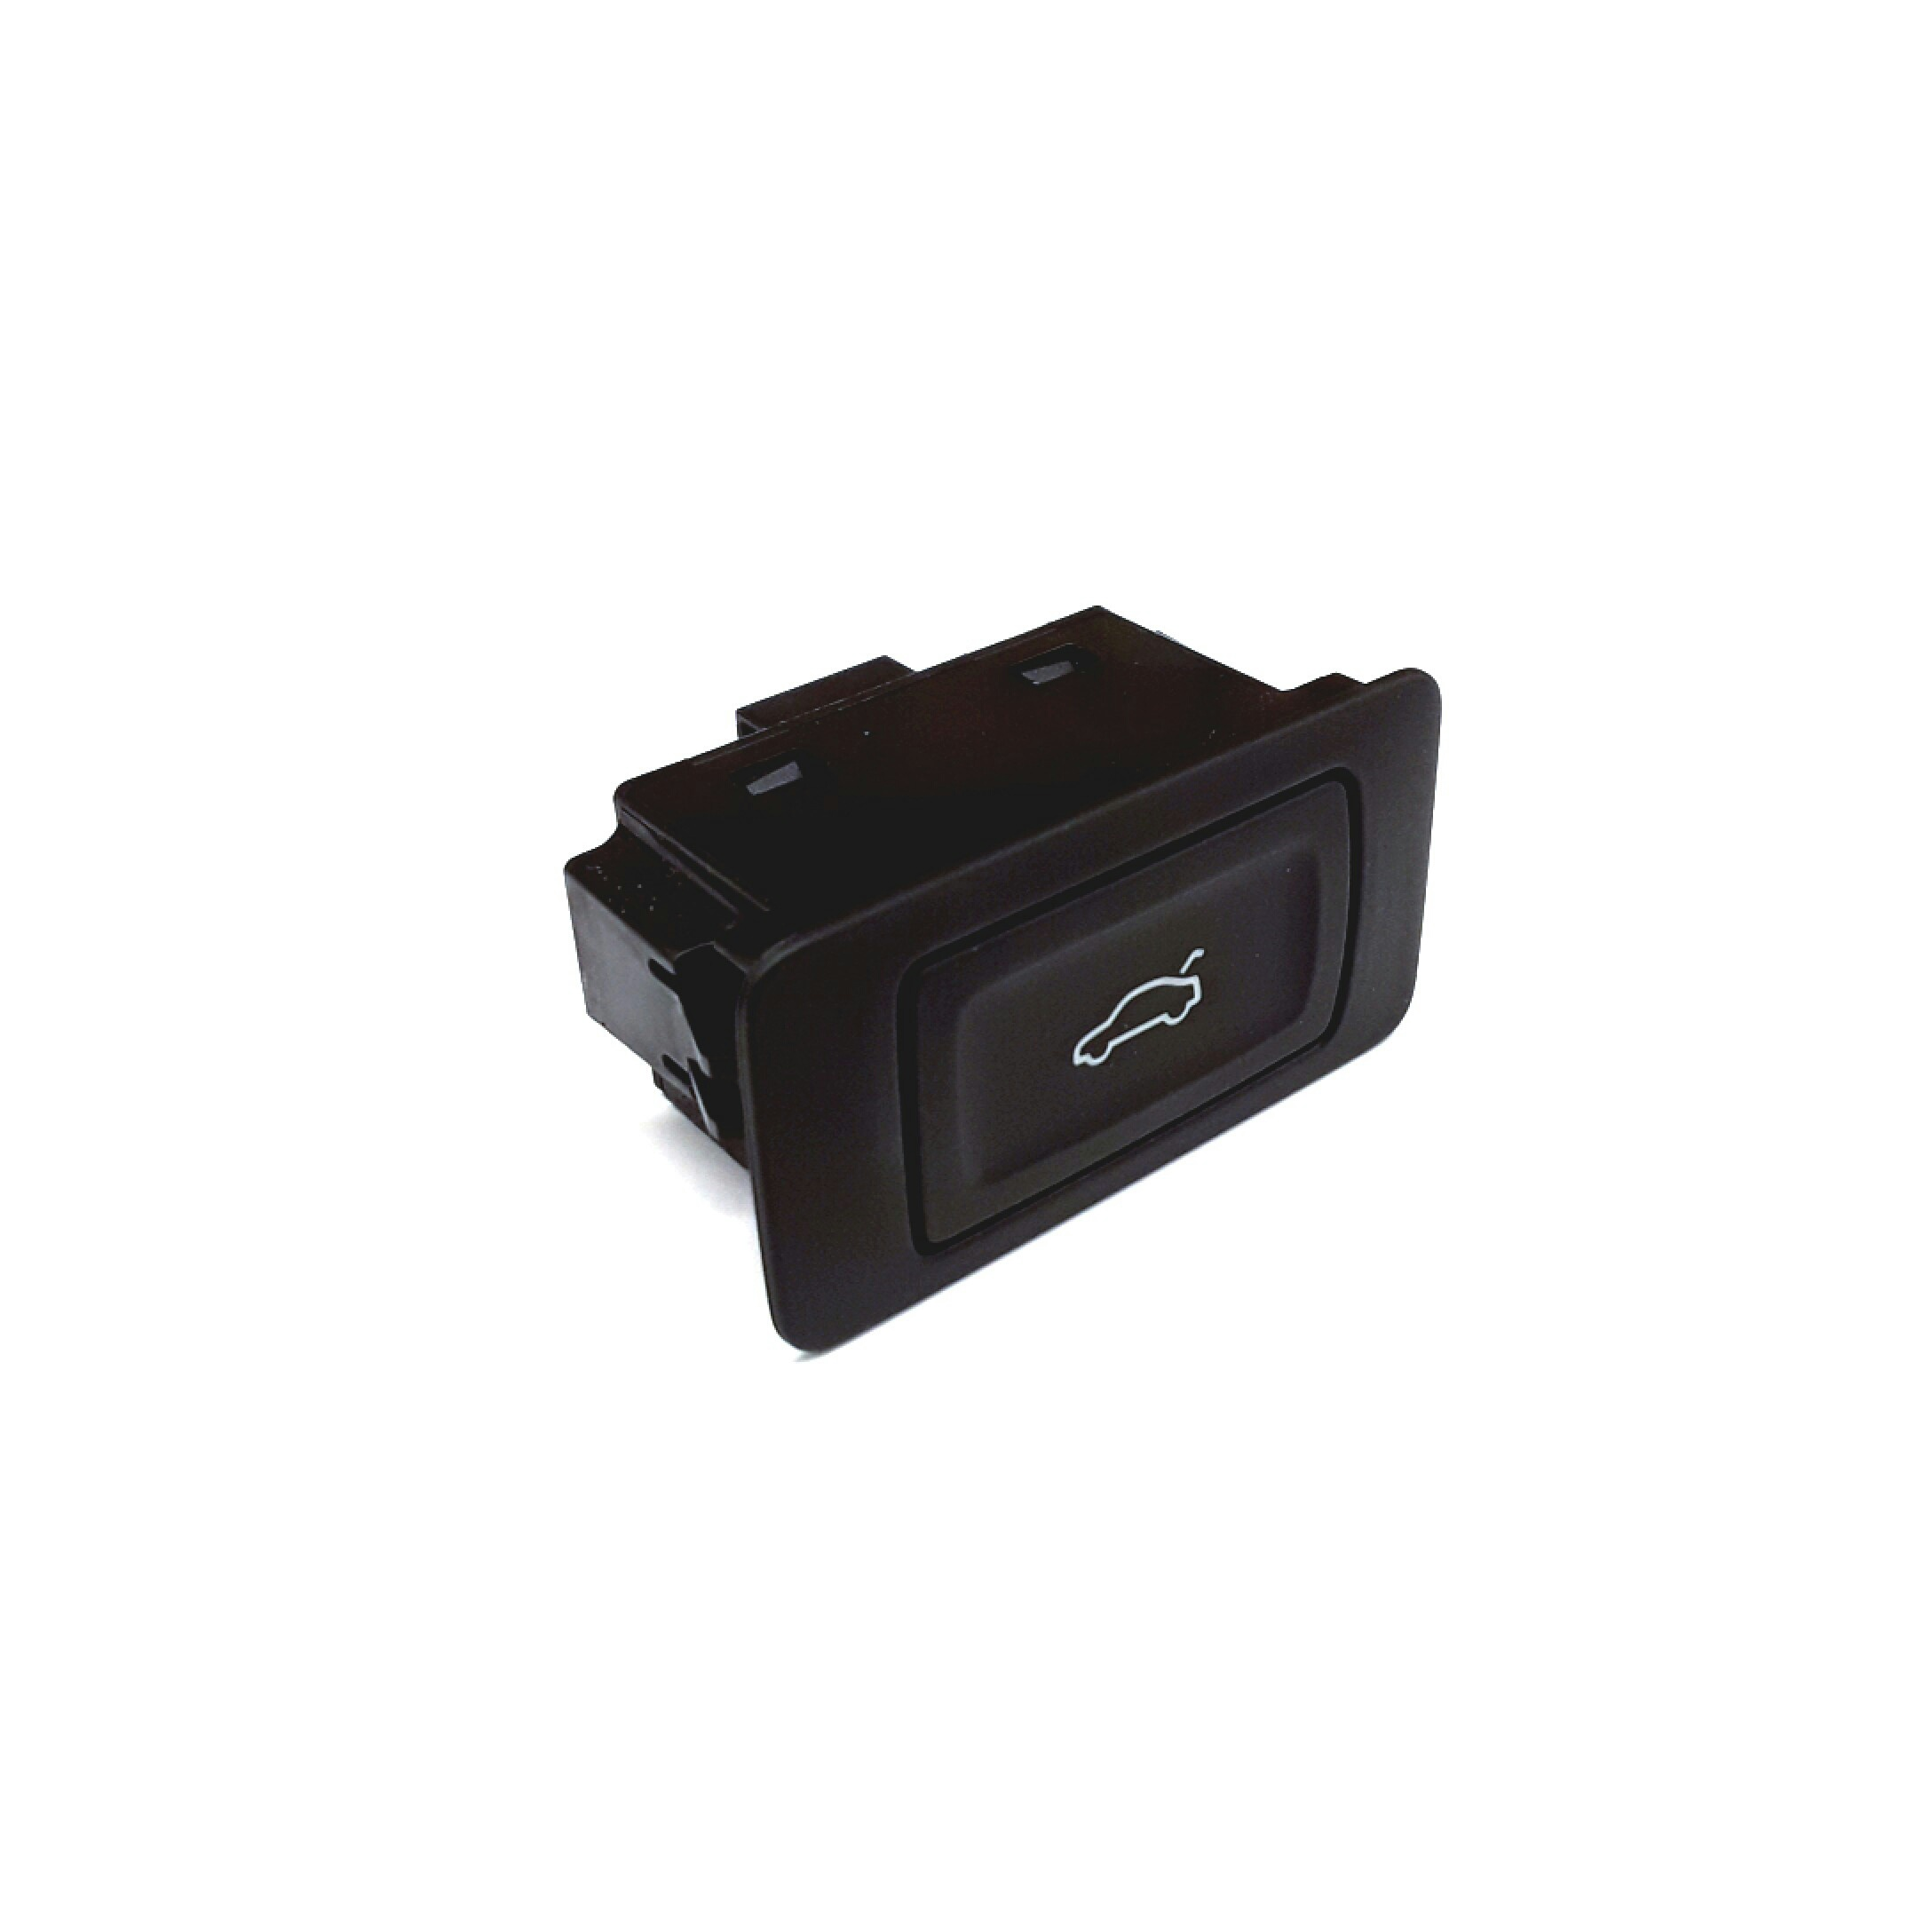 4g0959831a5pr switch release gate lift rear trim. Black Bedroom Furniture Sets. Home Design Ideas